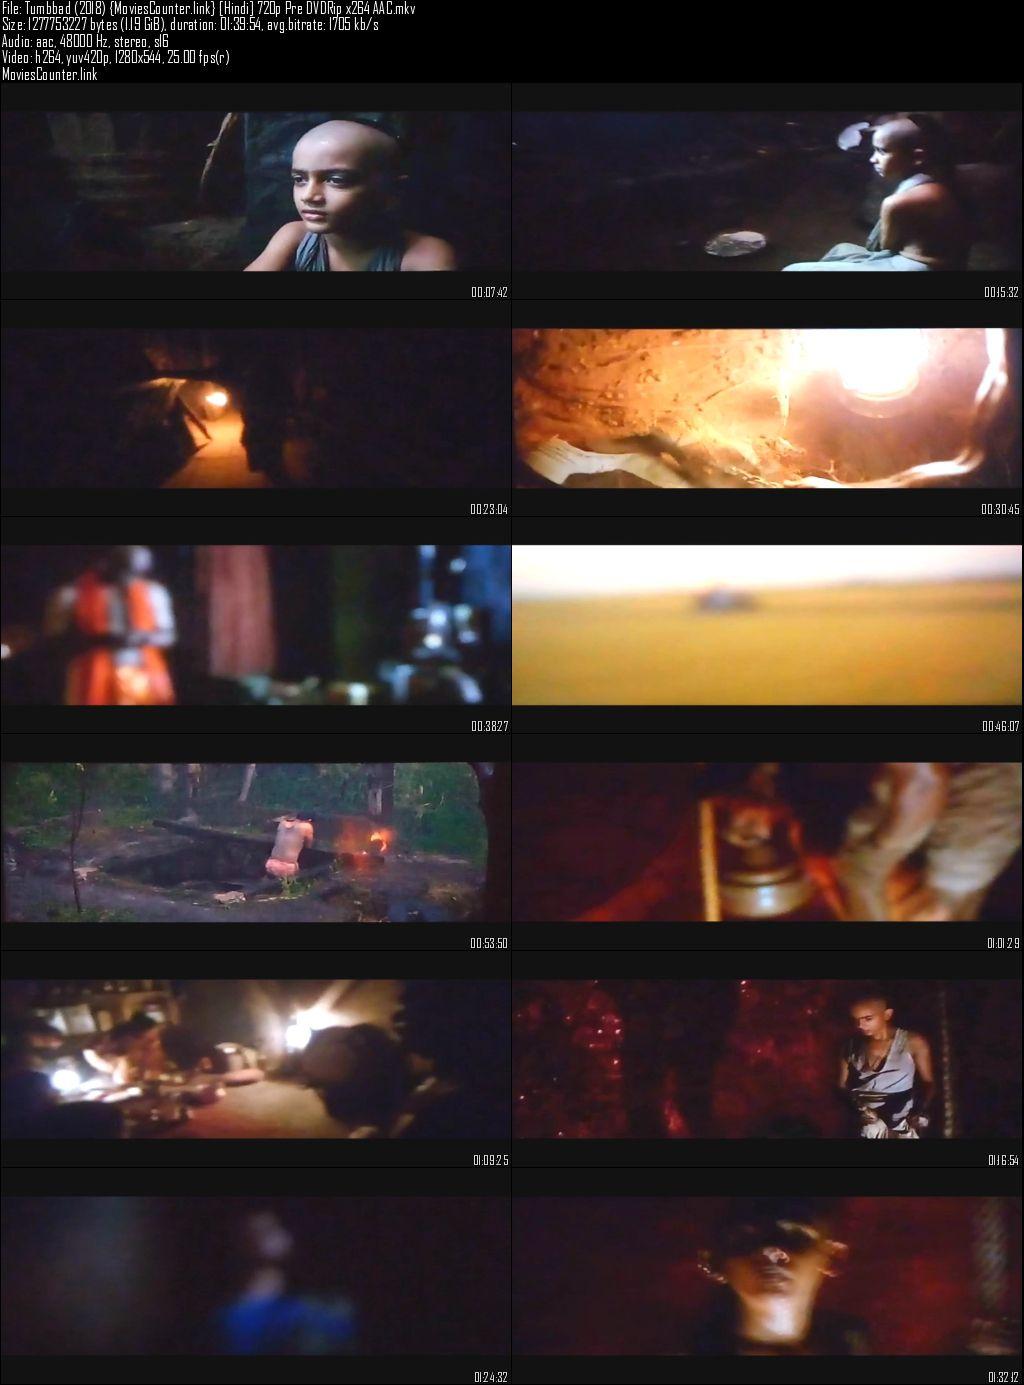 Screen Tumbbad 2018 Hindi Dubbed HD 720p